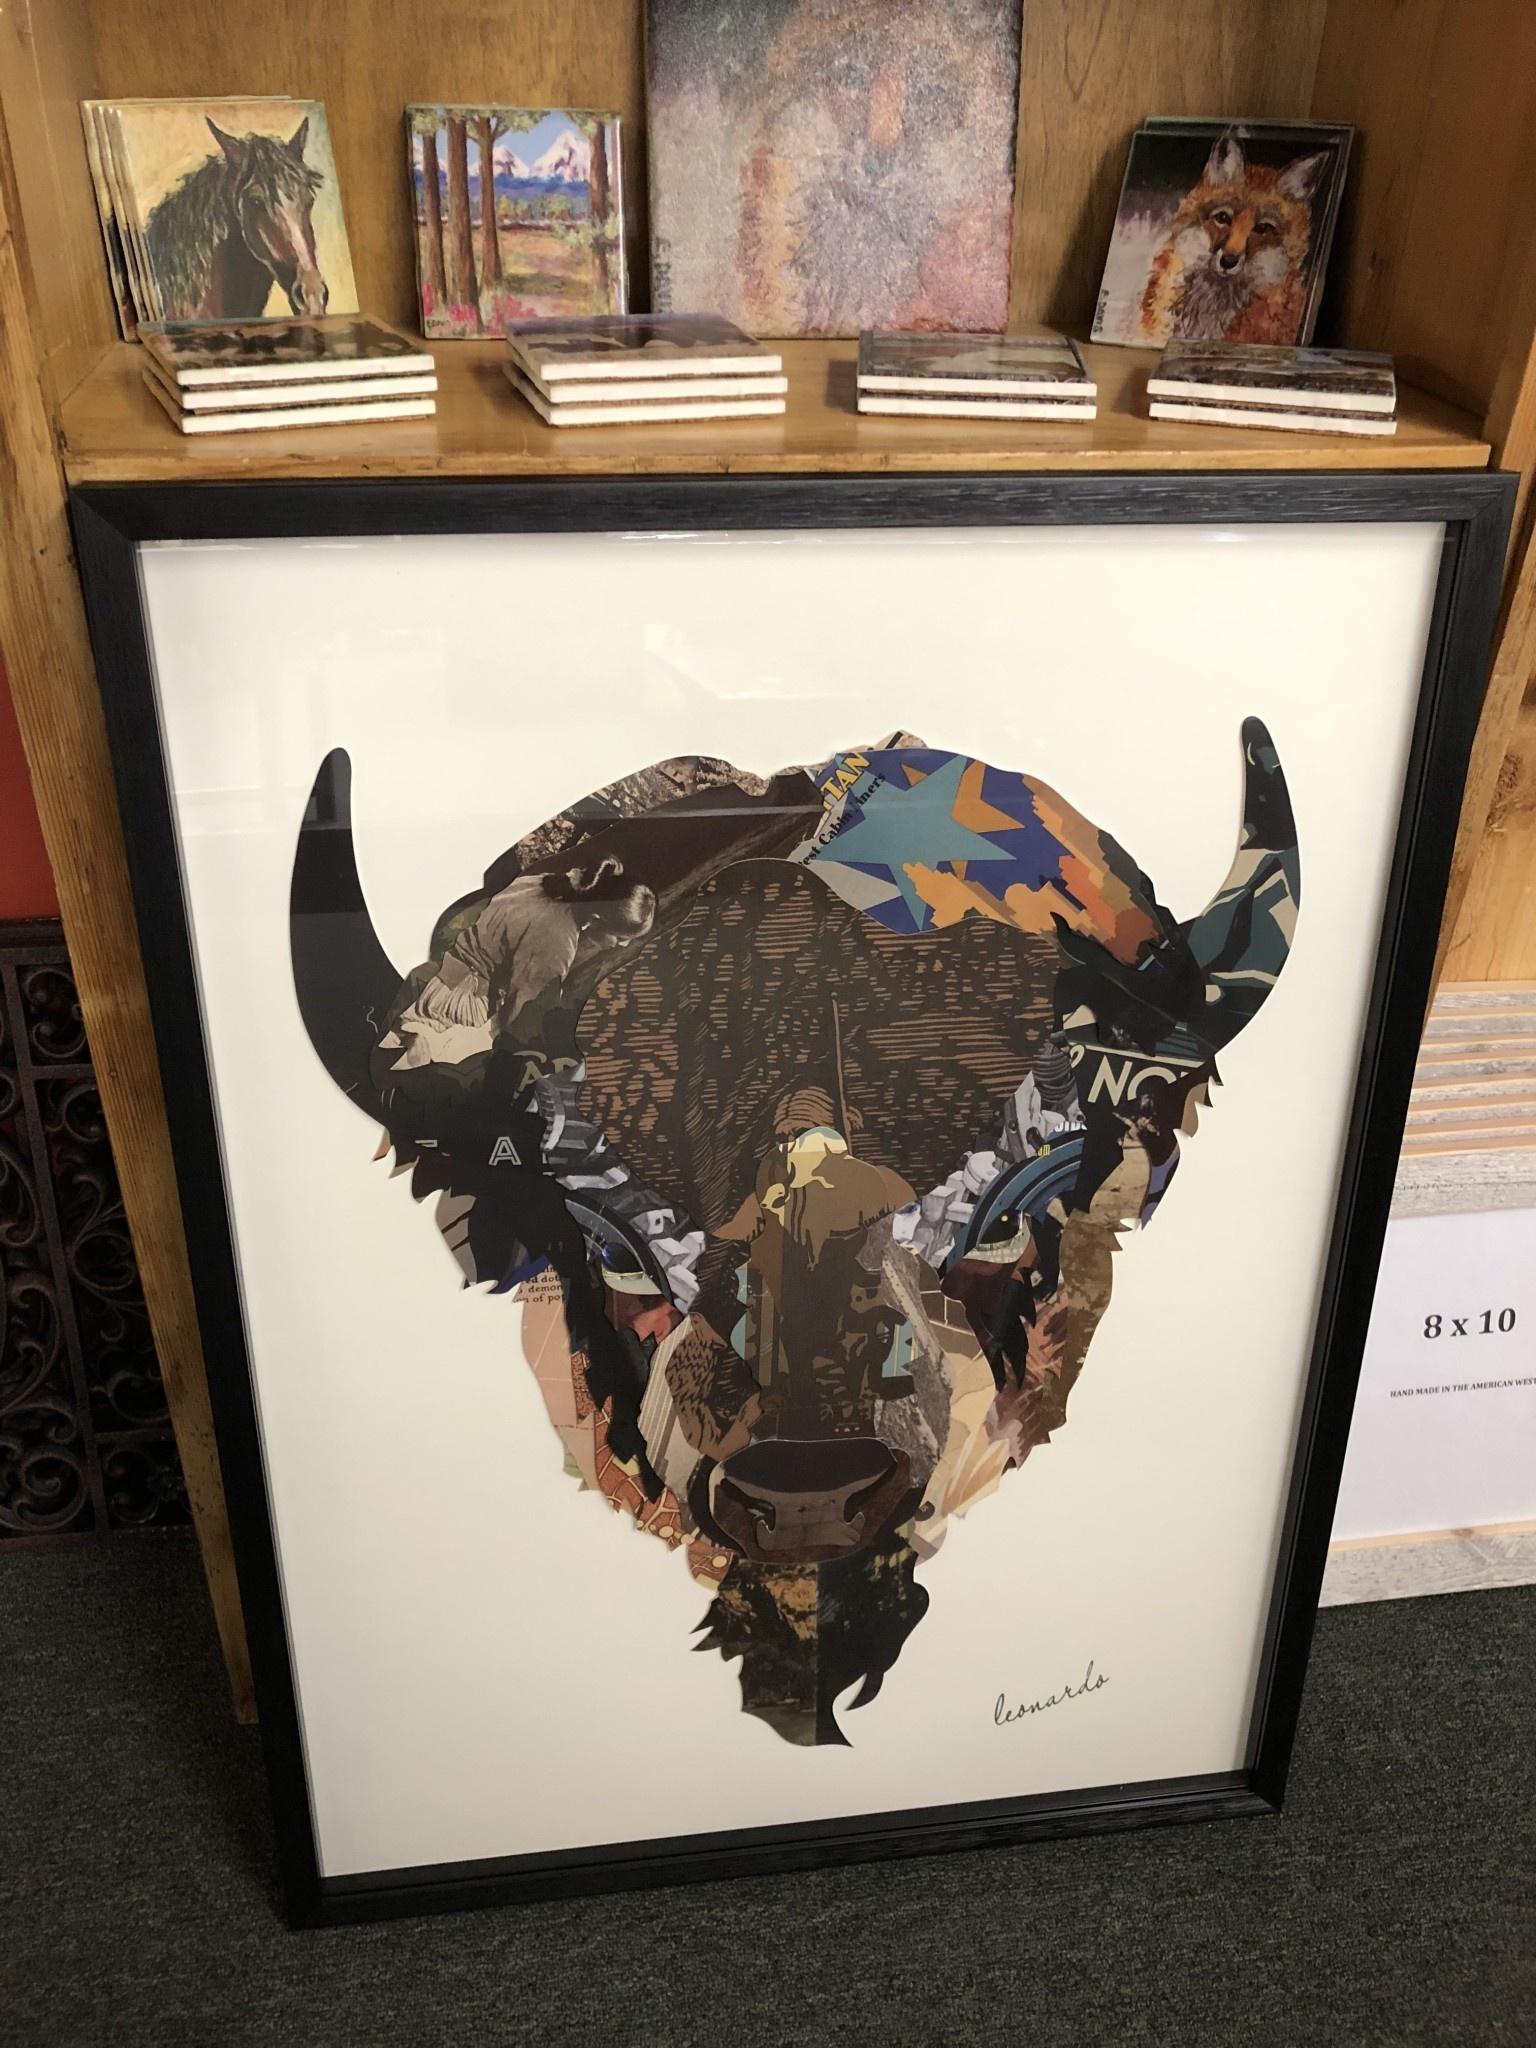 Simpkins-Canterbury Lane Collage 3D Art-Buffalo